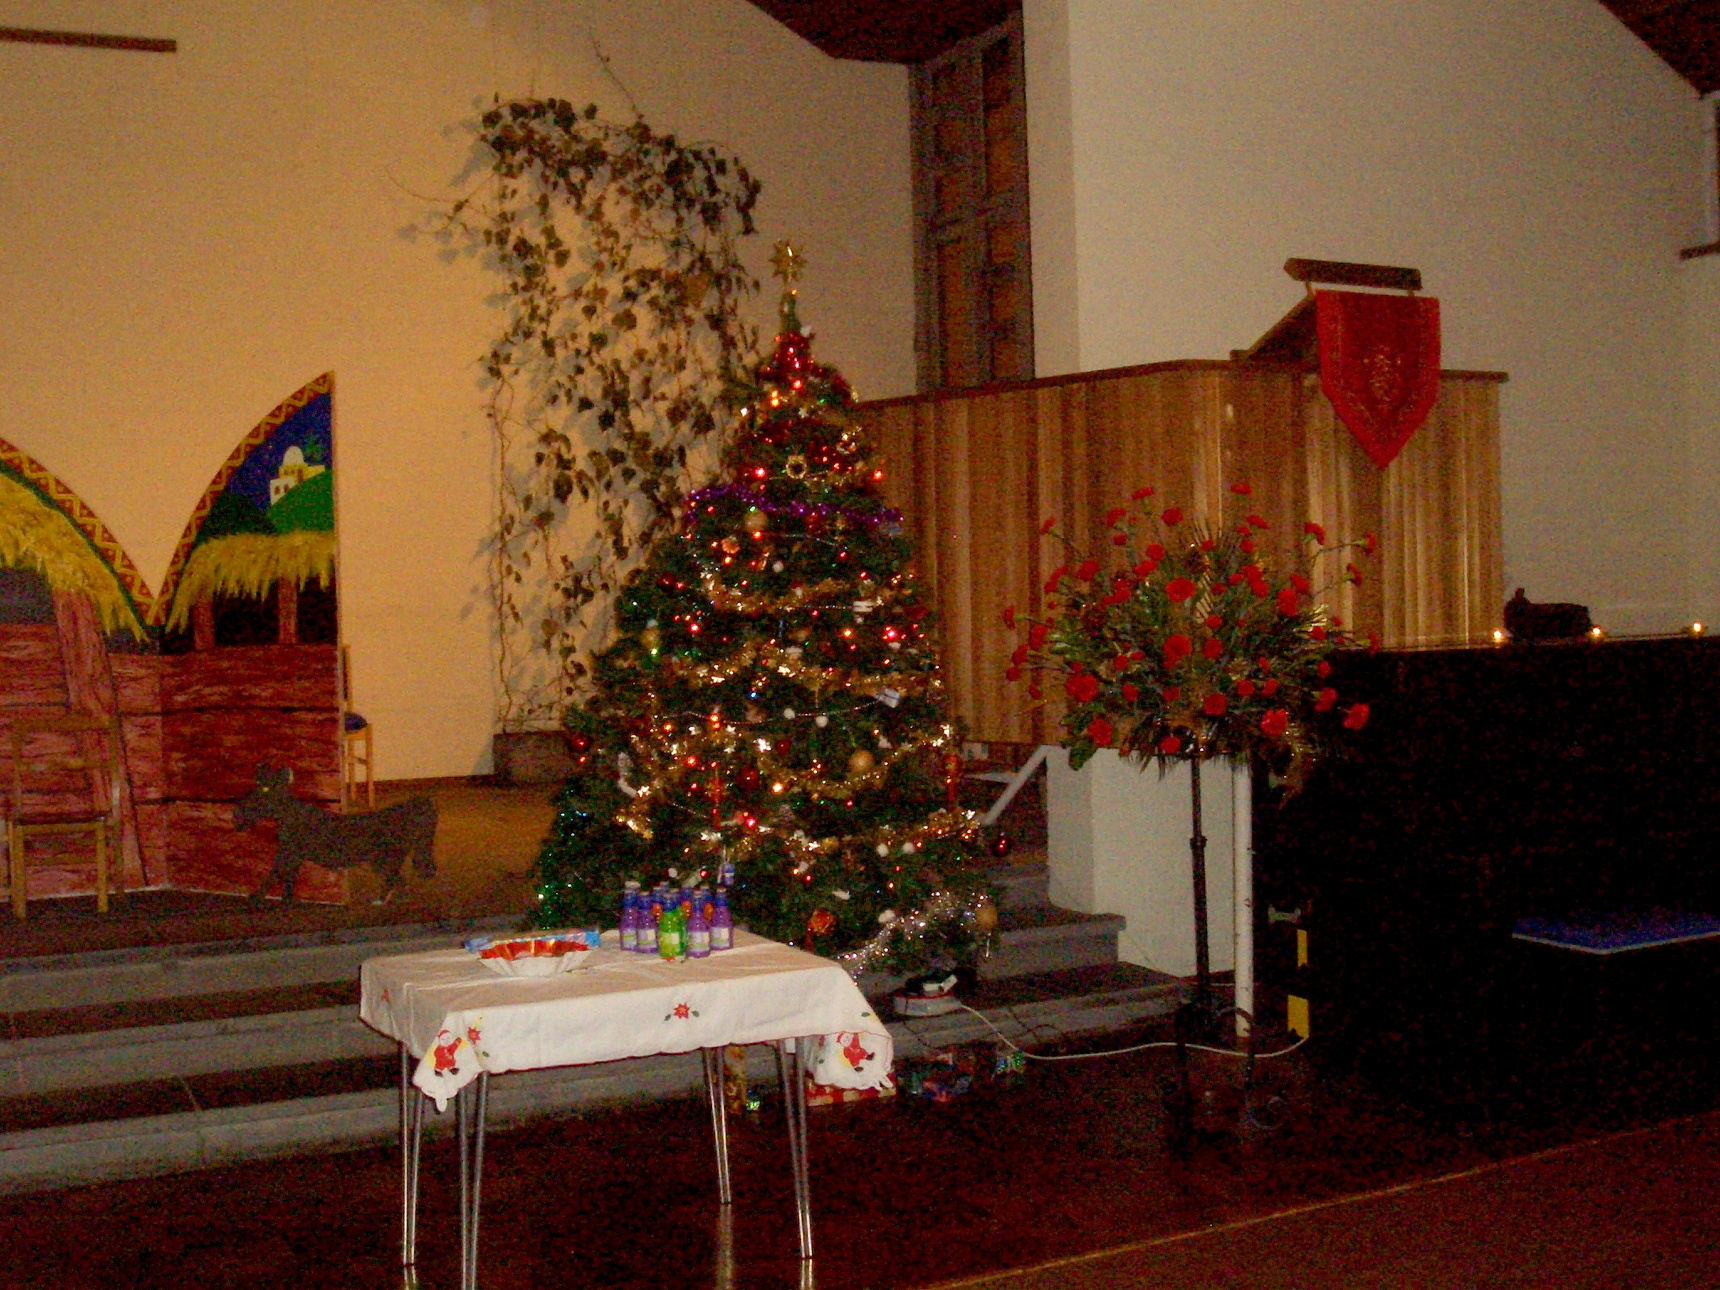 Christmas Eve at St John's Church, Oxgangs